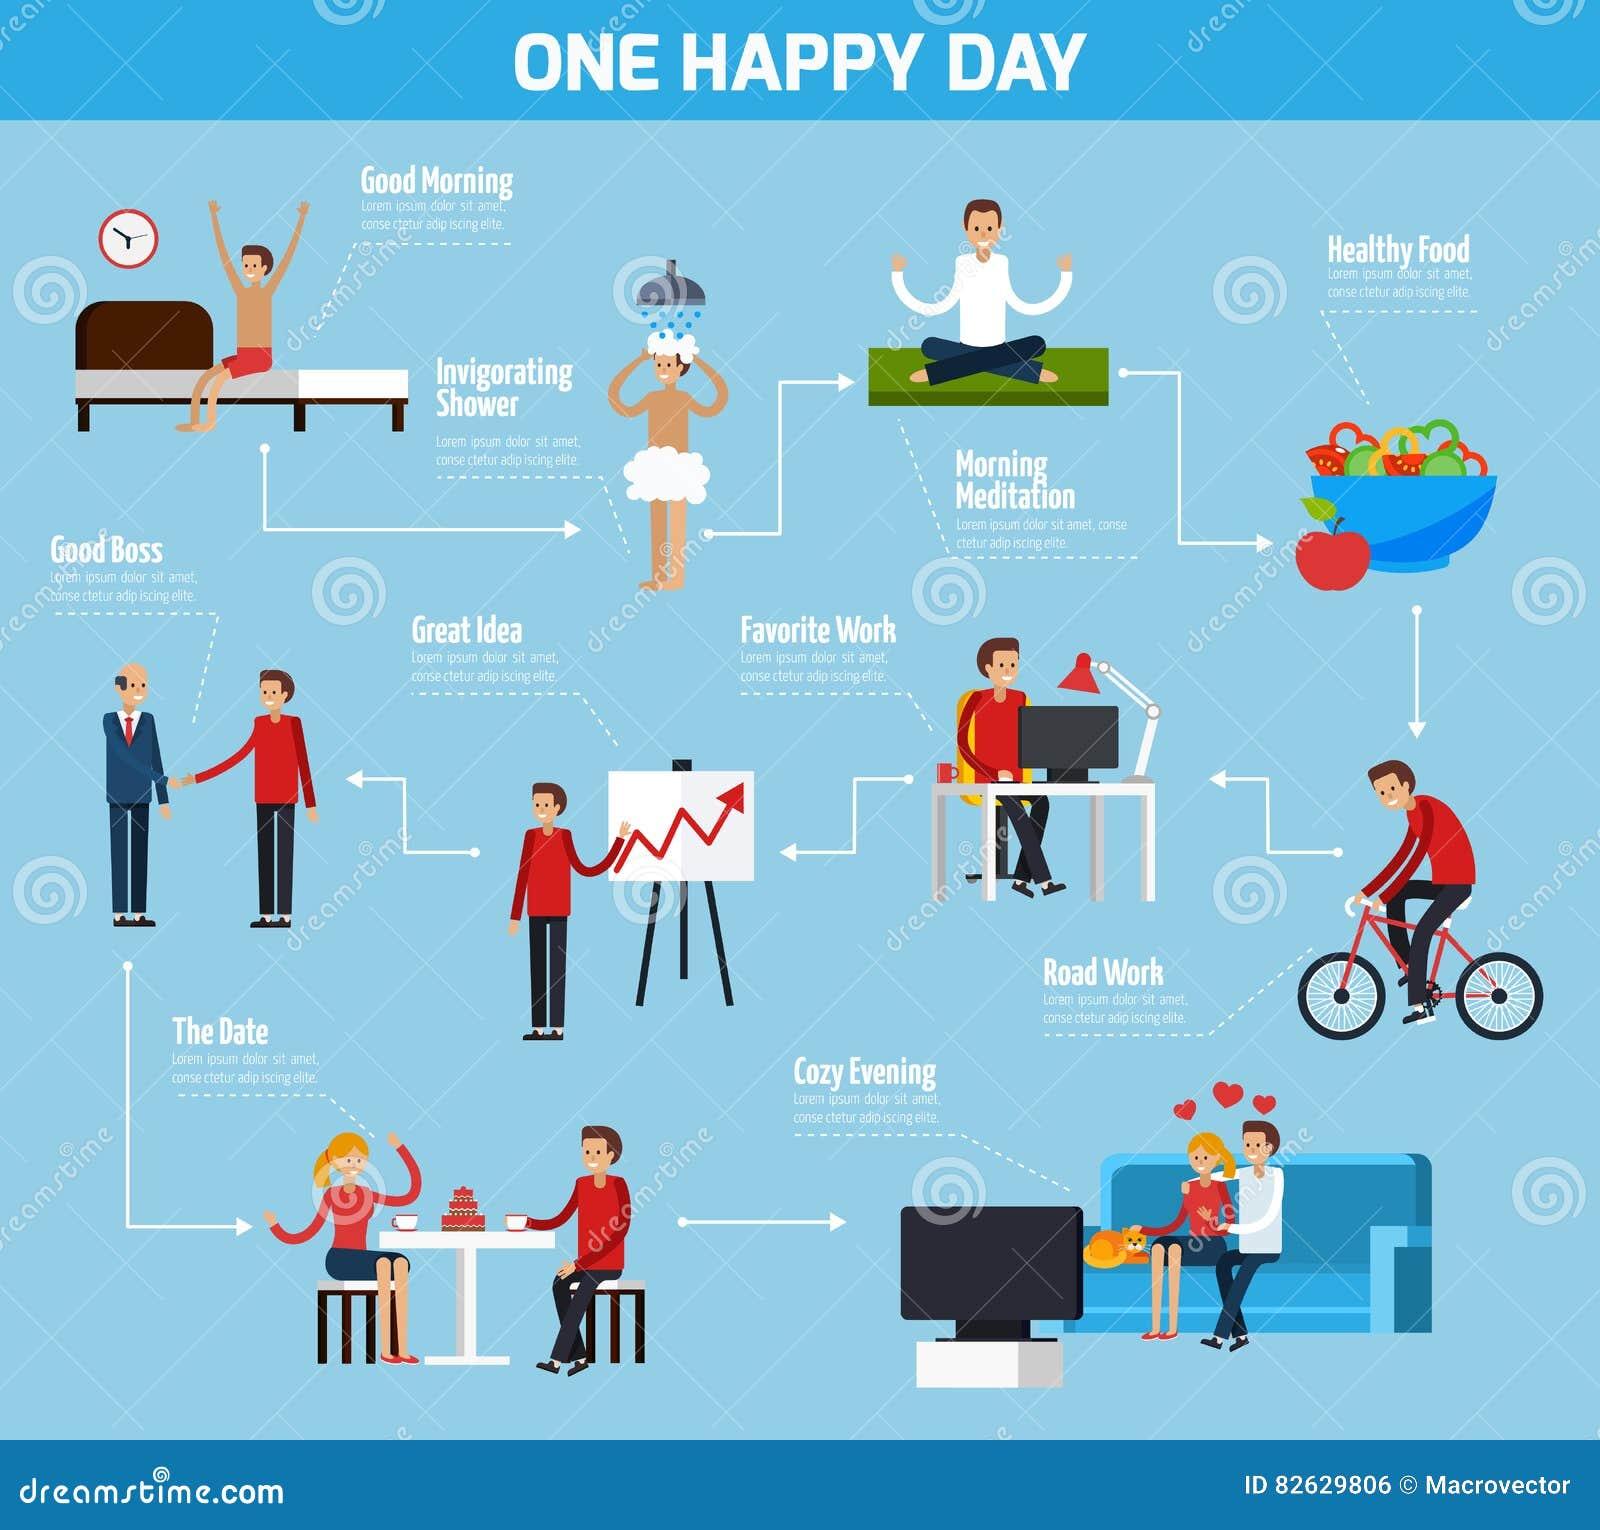 One Happy Day Flowchart